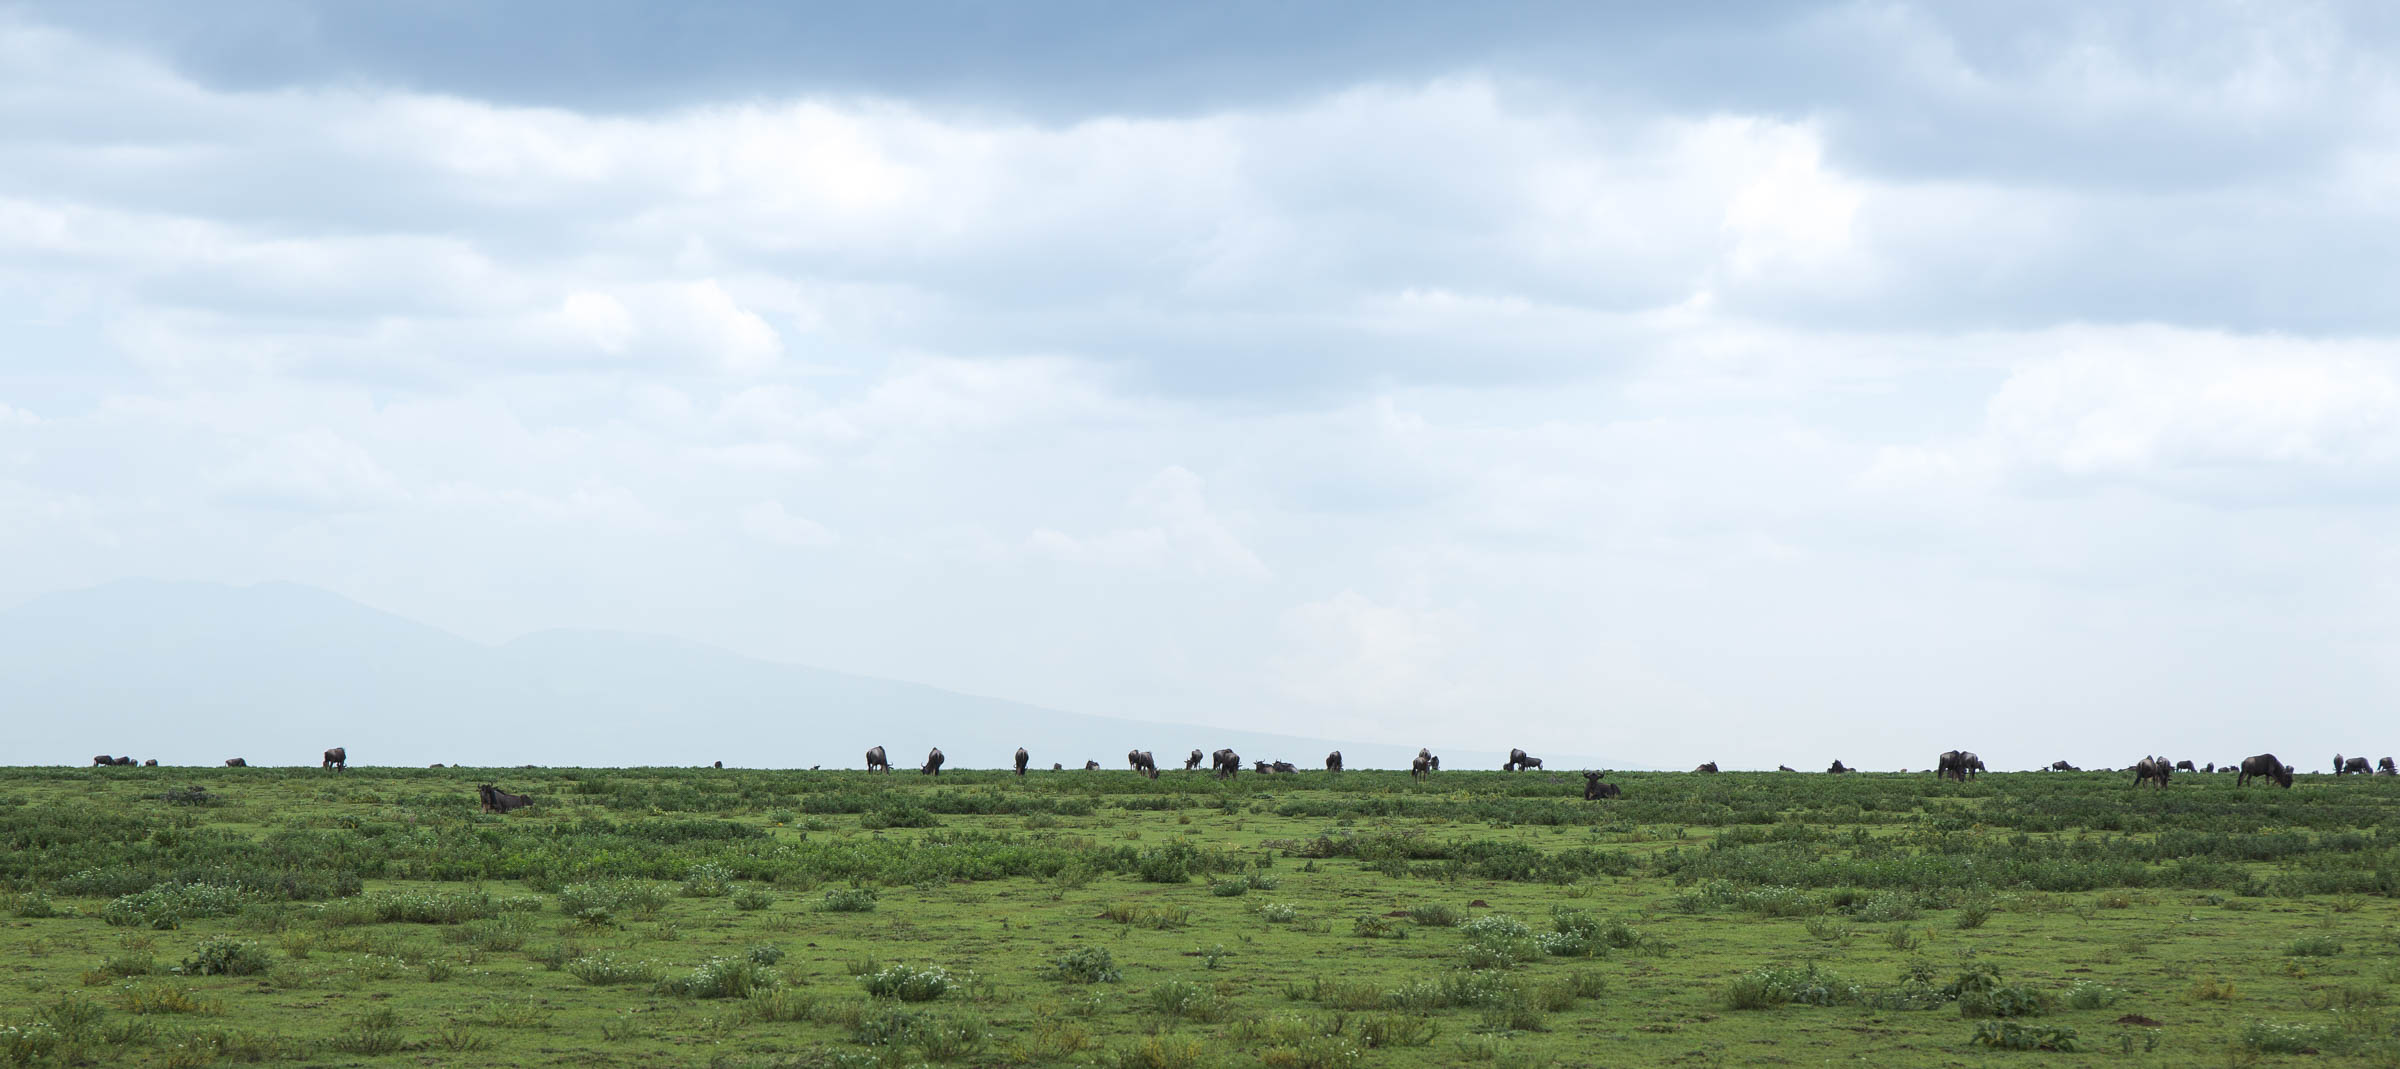 wildabeastland.jpg